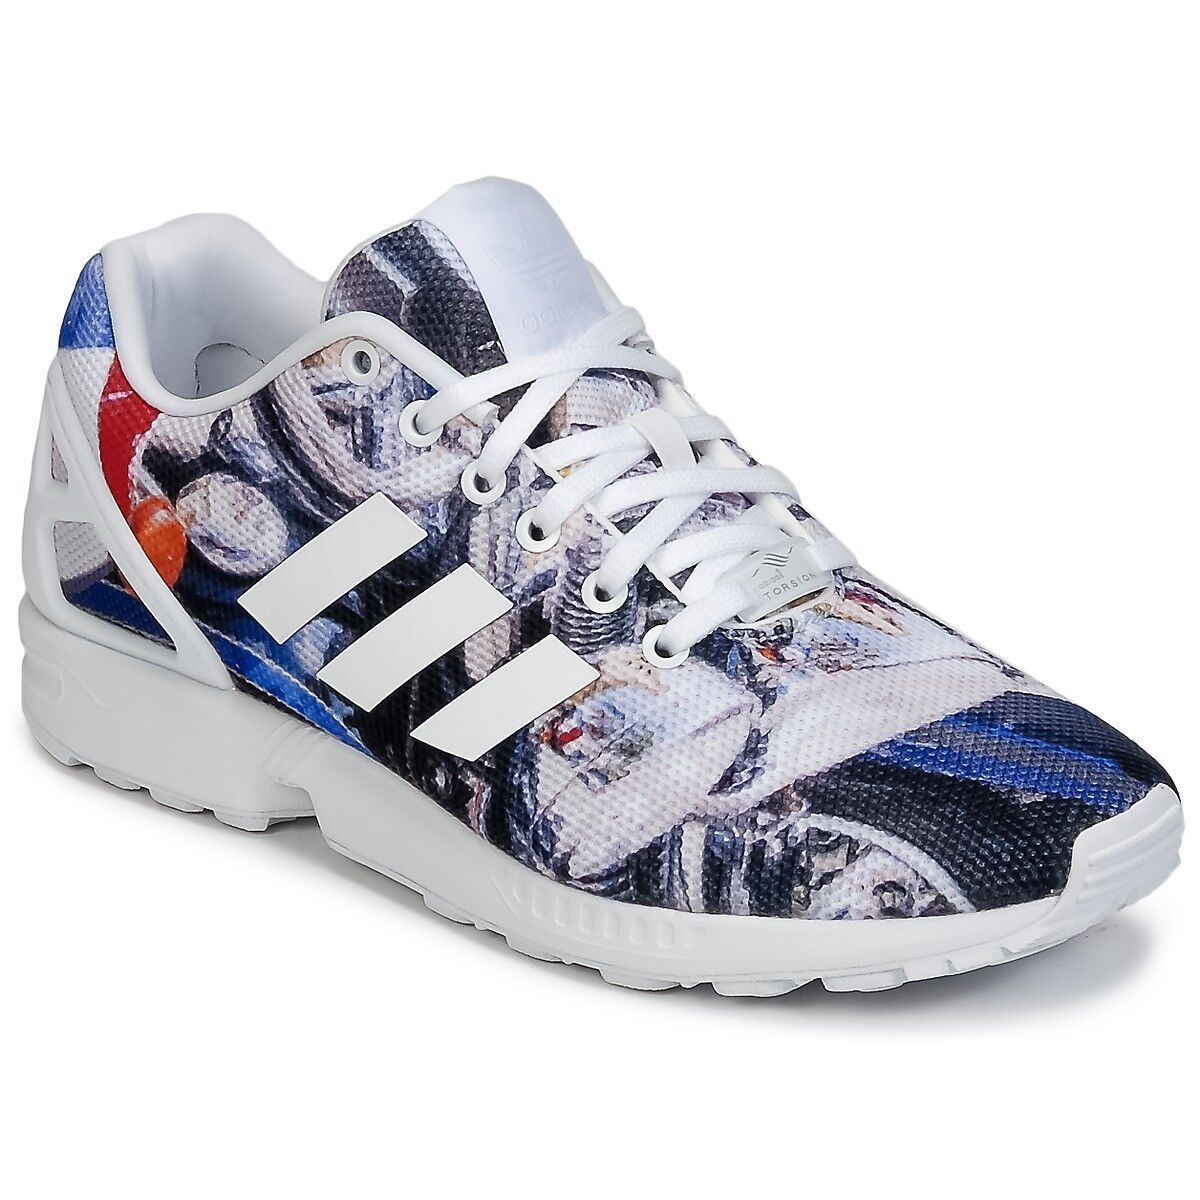 Adidas Trainers Originals Men's ZX Flux Trainers Adidas Shoes Multi Motorbike Print Size 4dd434